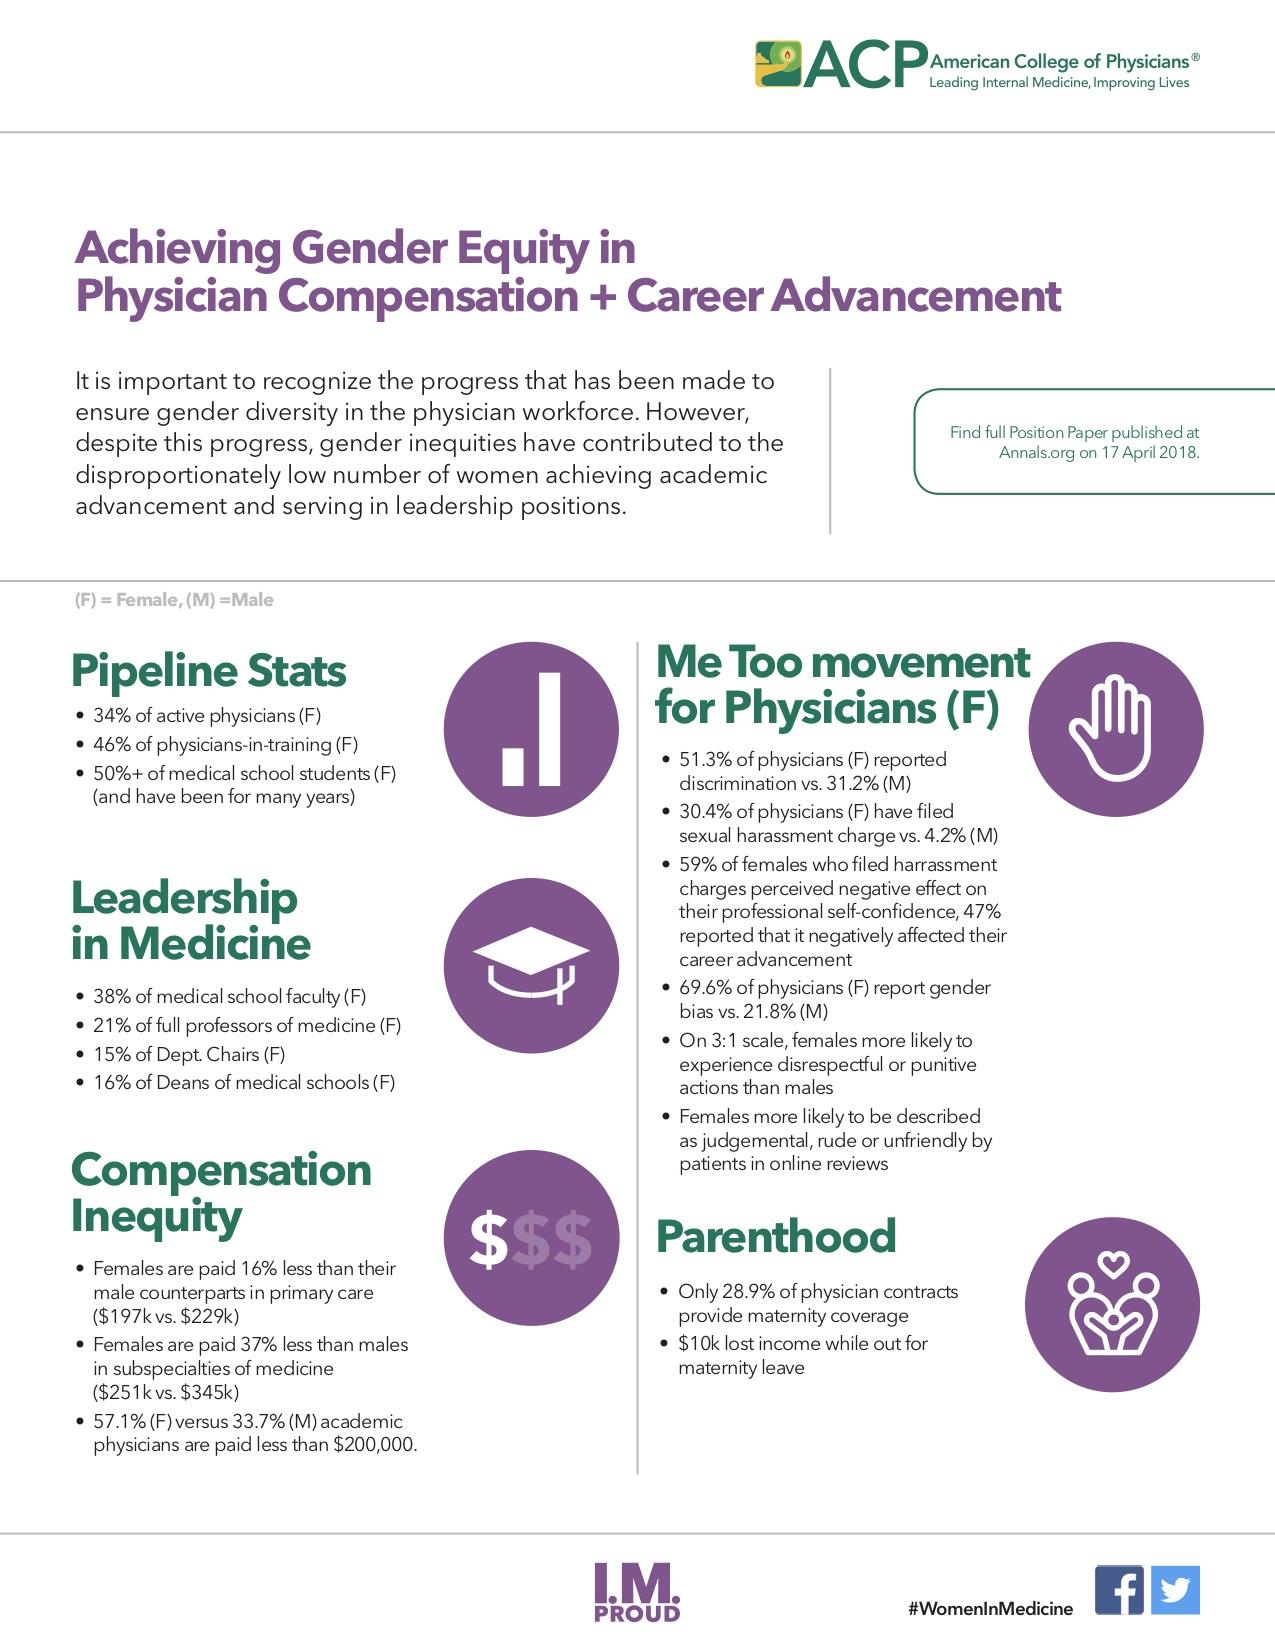 gender_equity_infographic.jpg